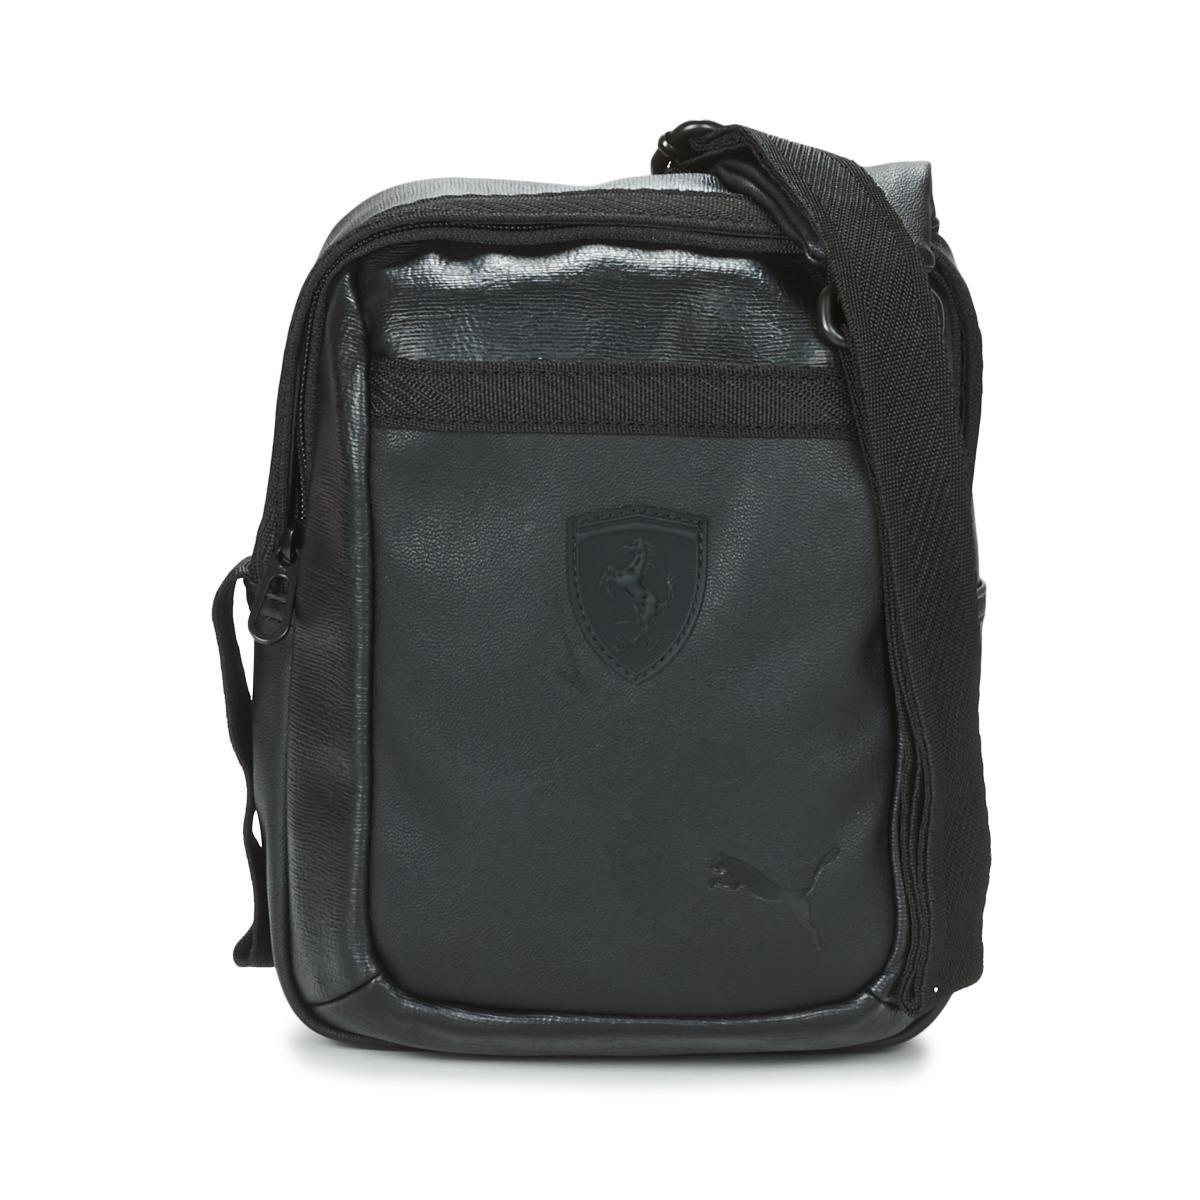 PUMA Ferrari Ls Portable Men s Pouch In Black in Black for Men - Lyst e7017ab16dc0c